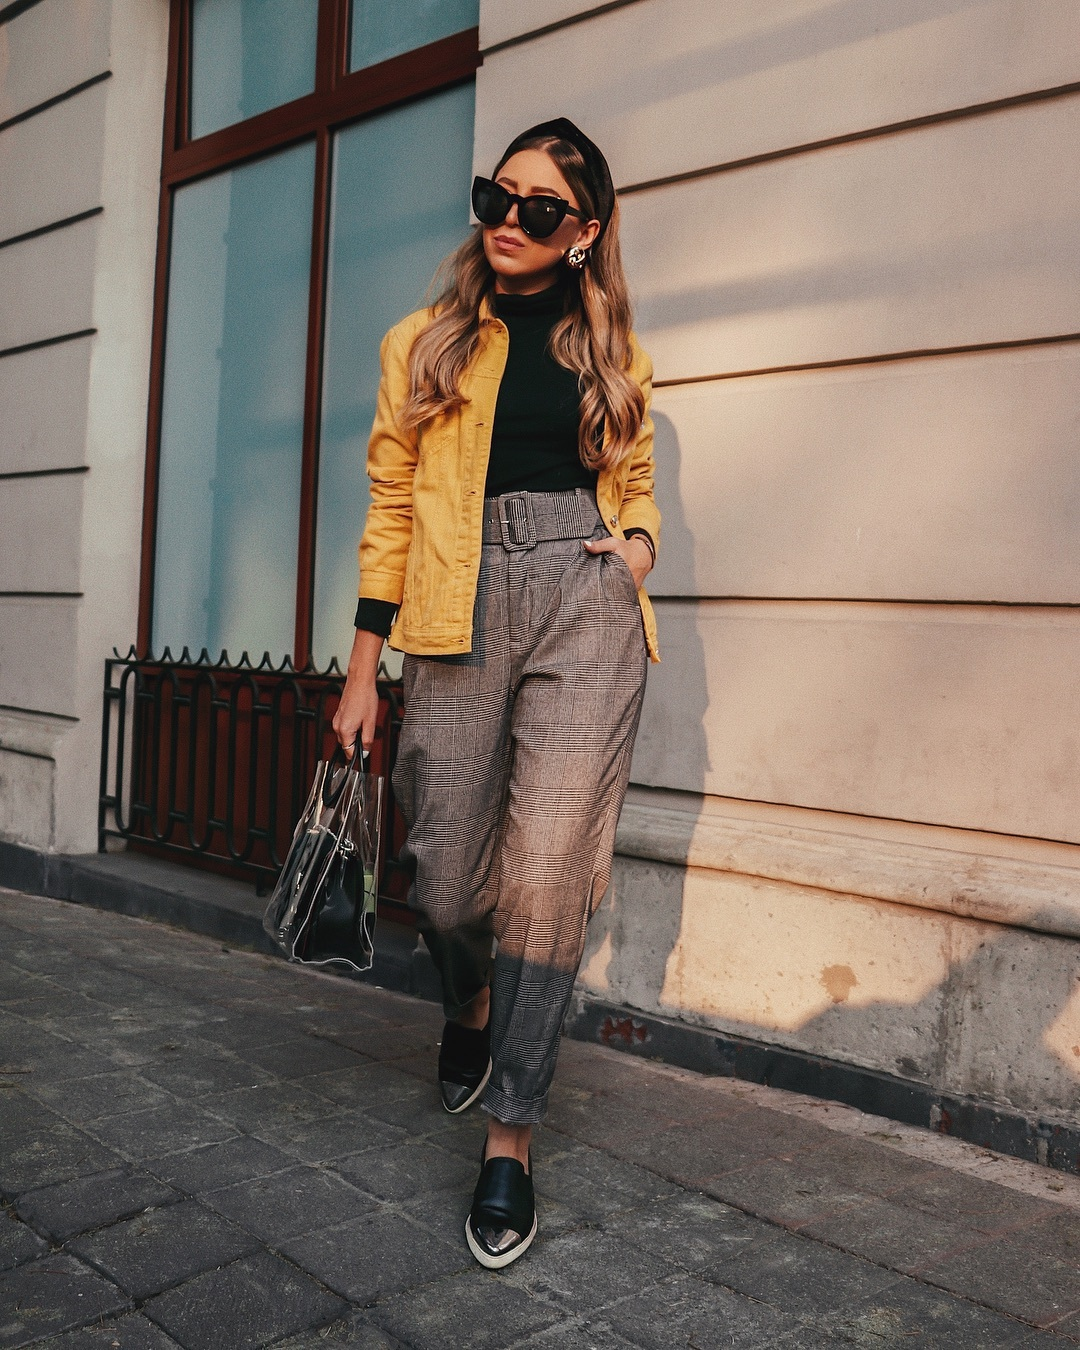 jacket denim jacket yellow jacket black shoes plaid high waisted pants grey pants black bag pvc handbag black turtleneck top